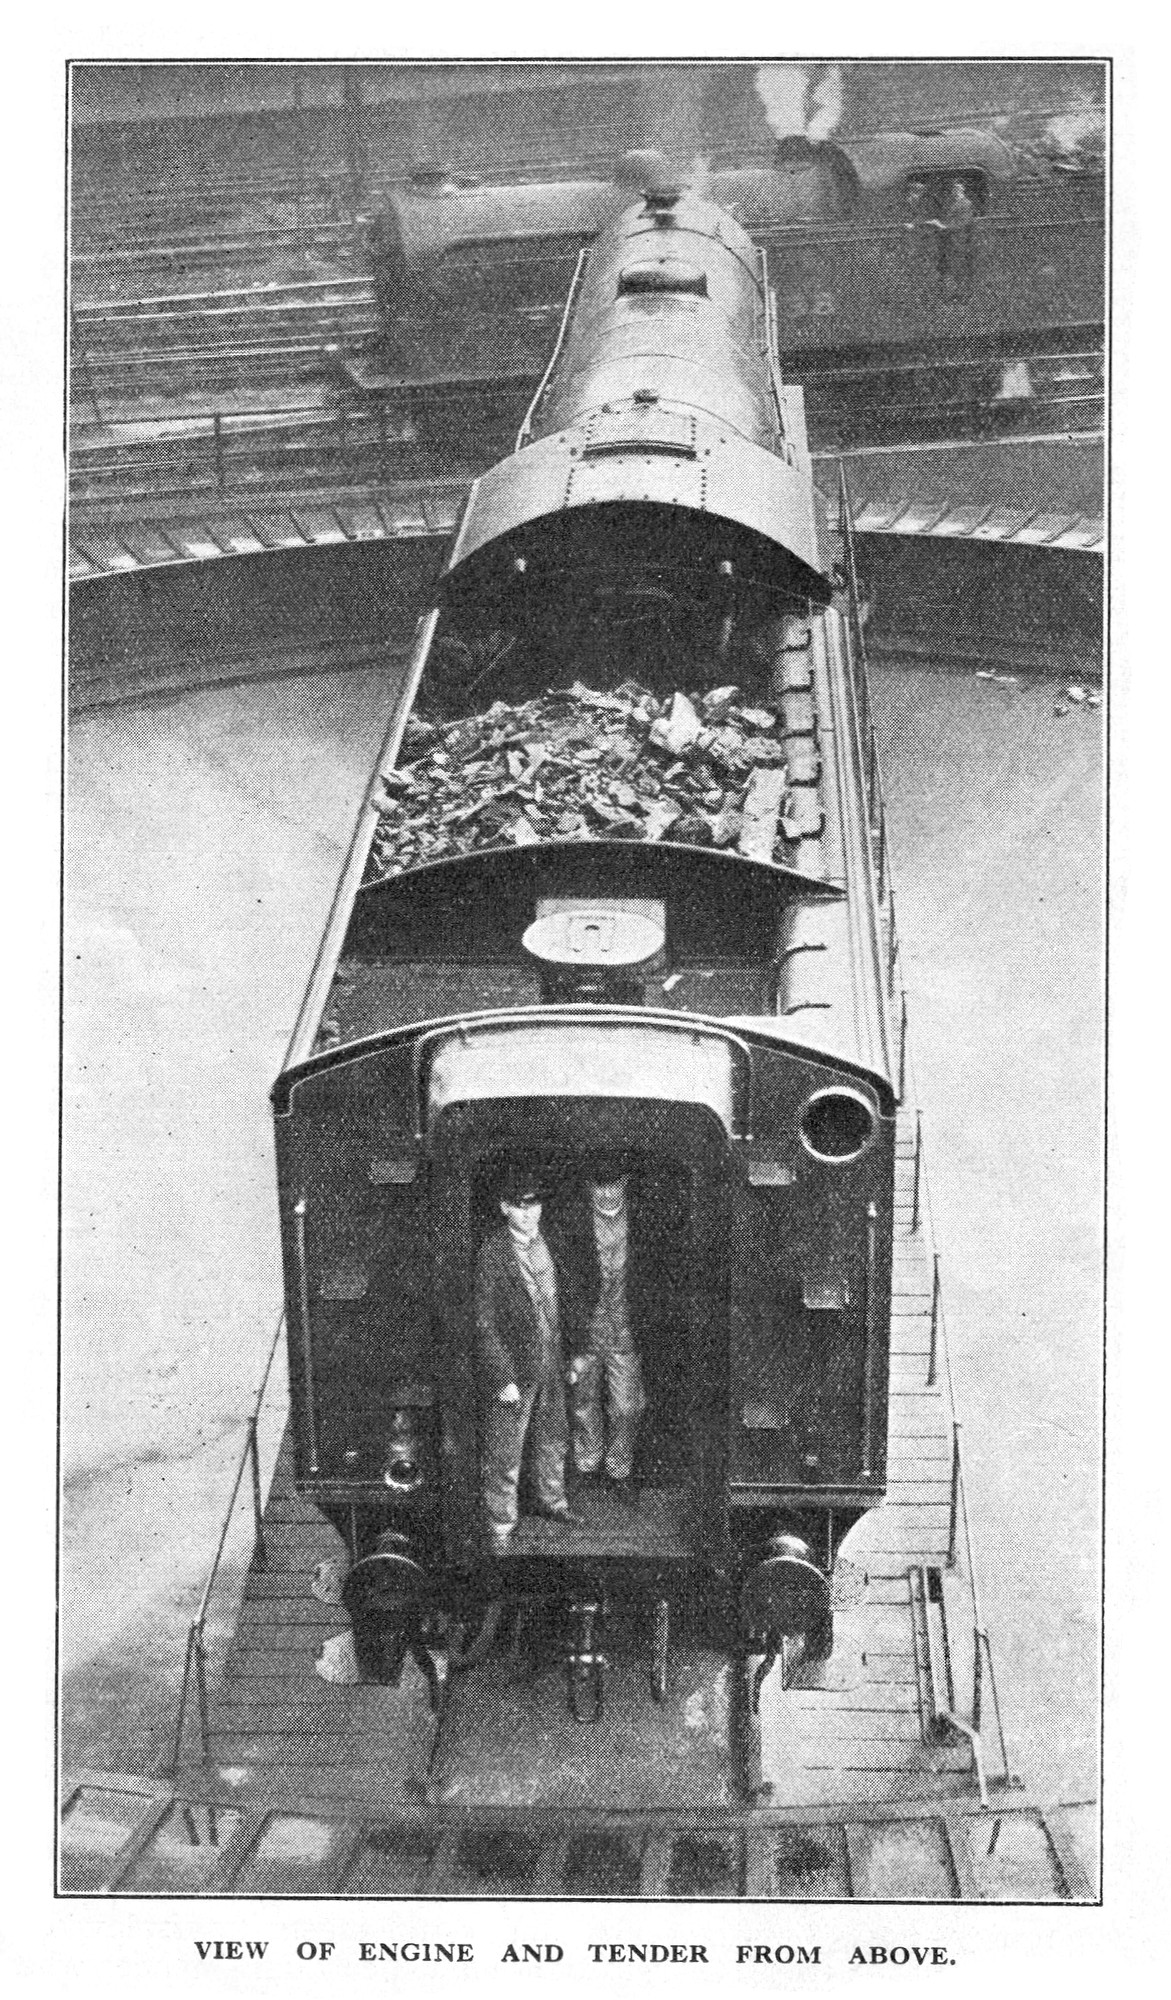 Flying Scotsman Gresley A1  A3 Steam Locomotive  1923